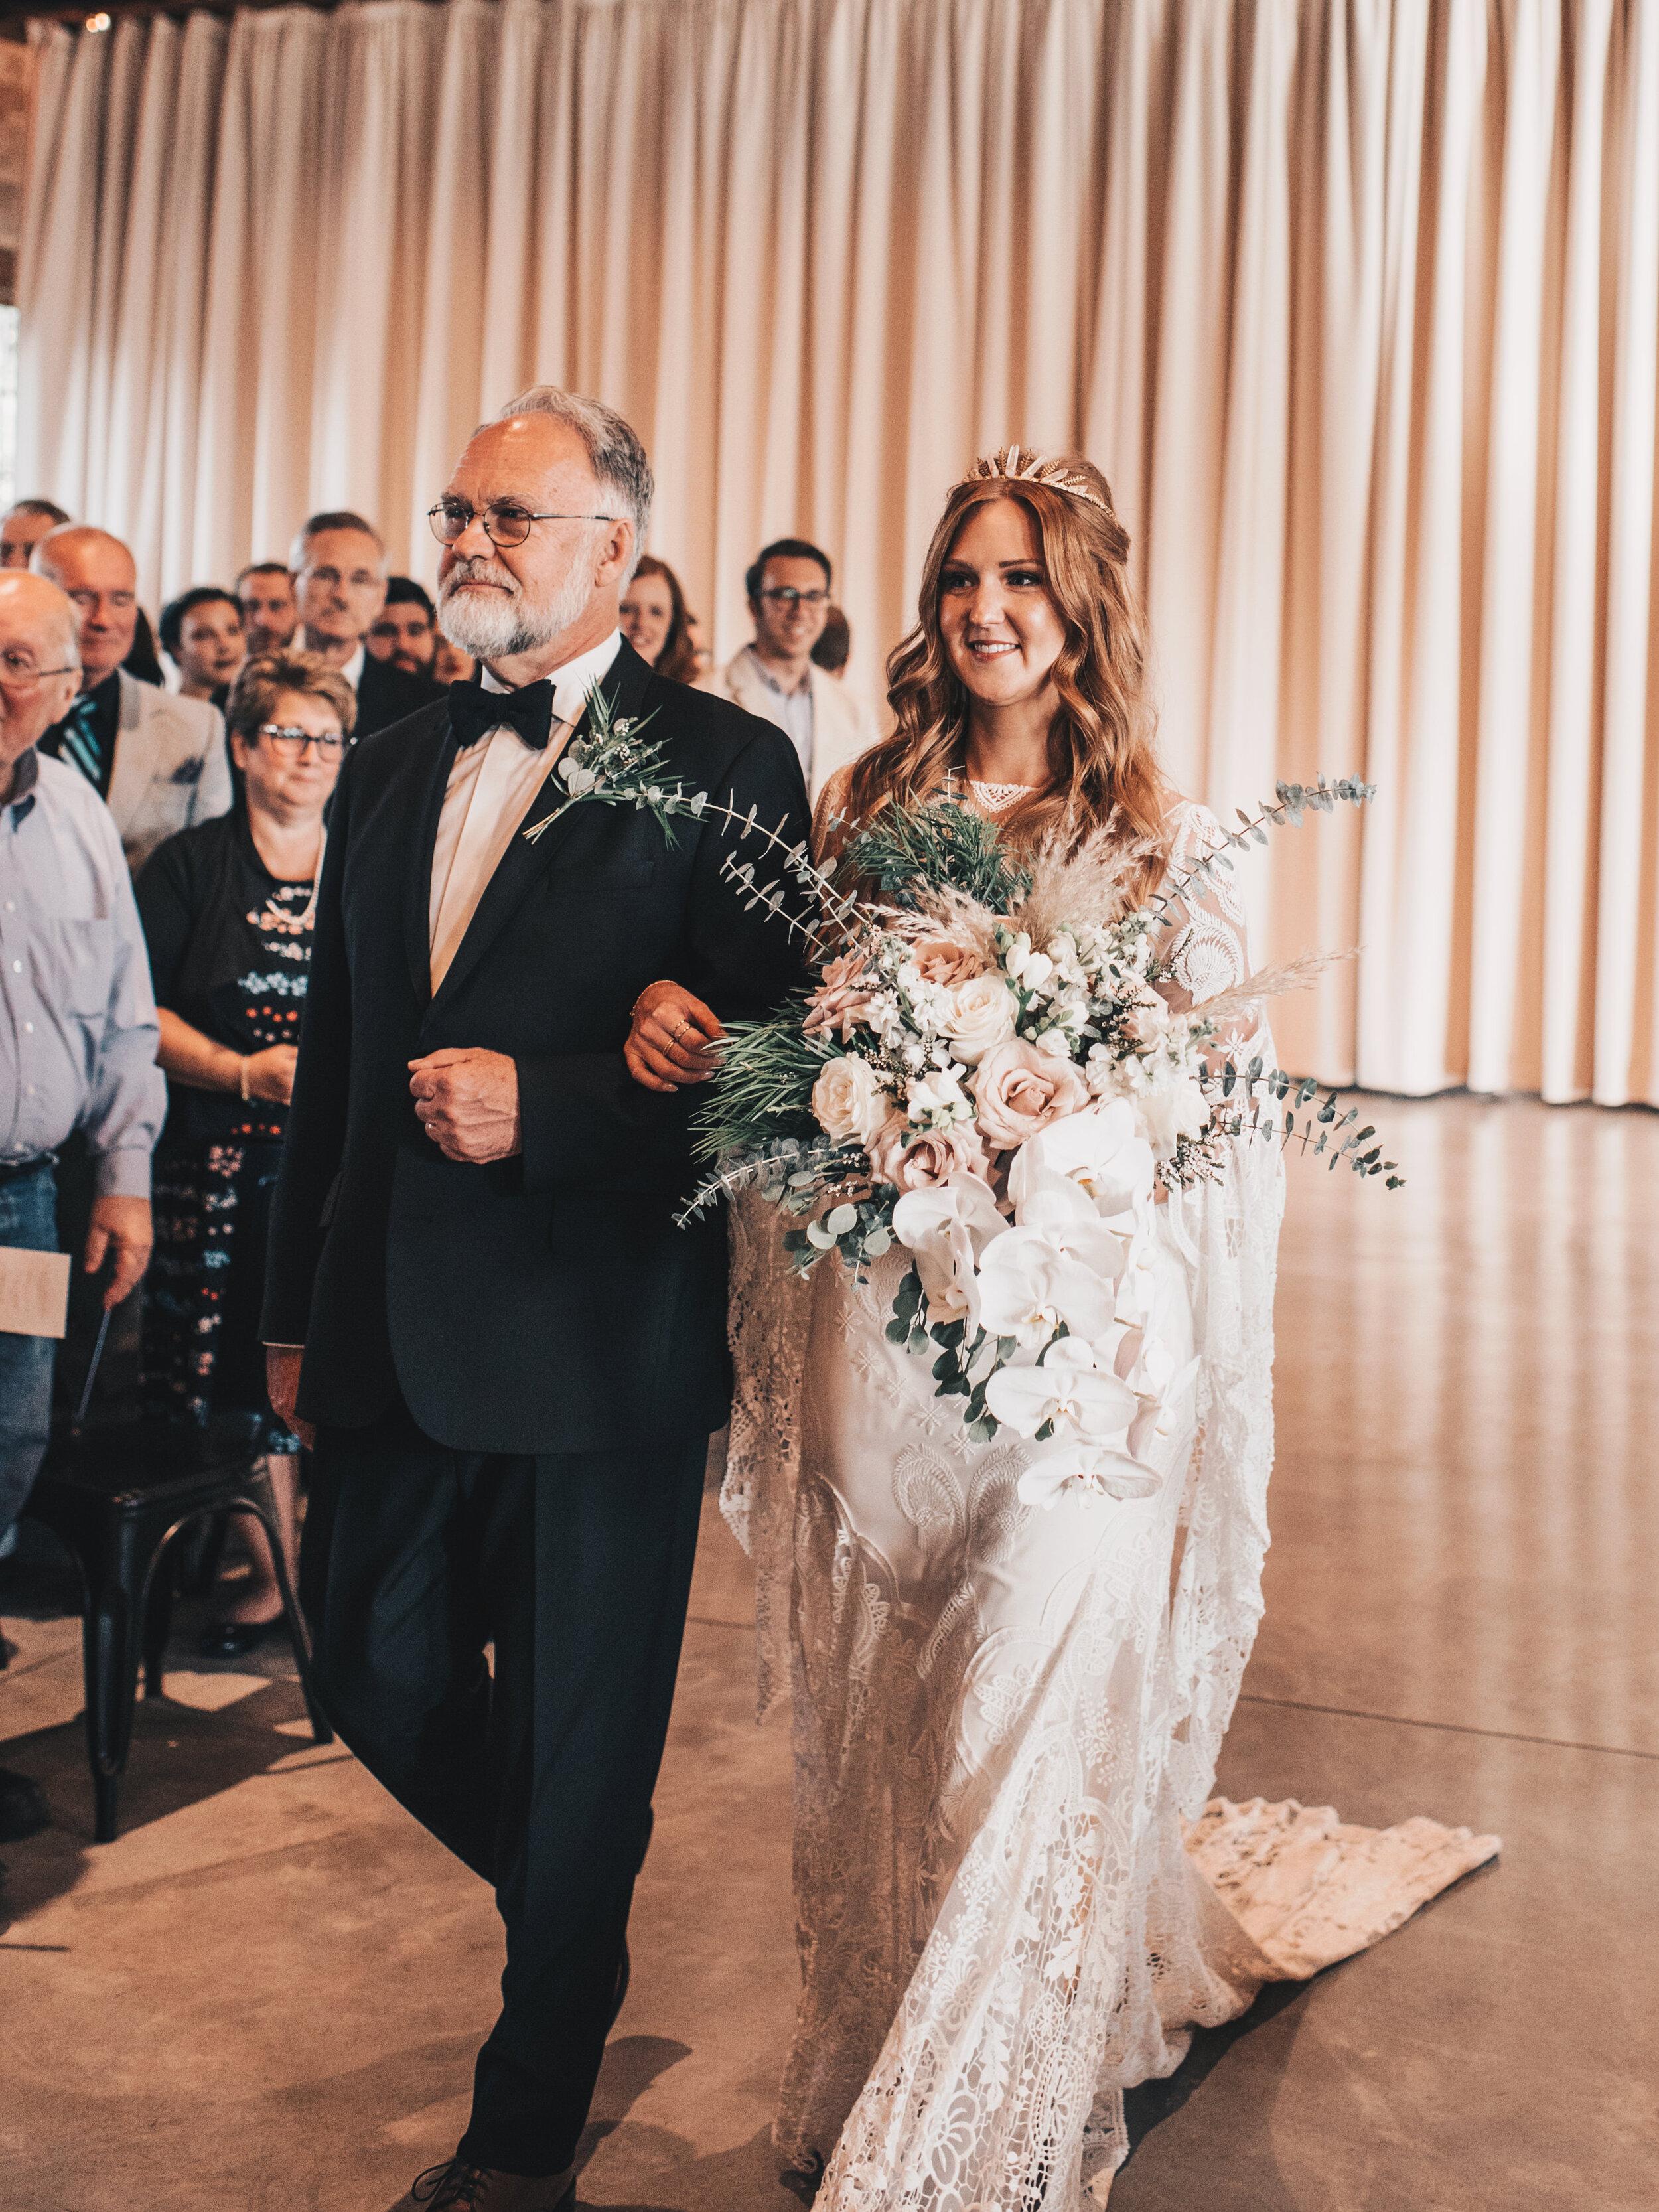 Modern Industrial Wedding, The Brix on the Fox, The BRIX, Chicago Industrial Wedding, Modern Midwest Wedding, The Brix on the Fox Wedding, The BRIX Wedding